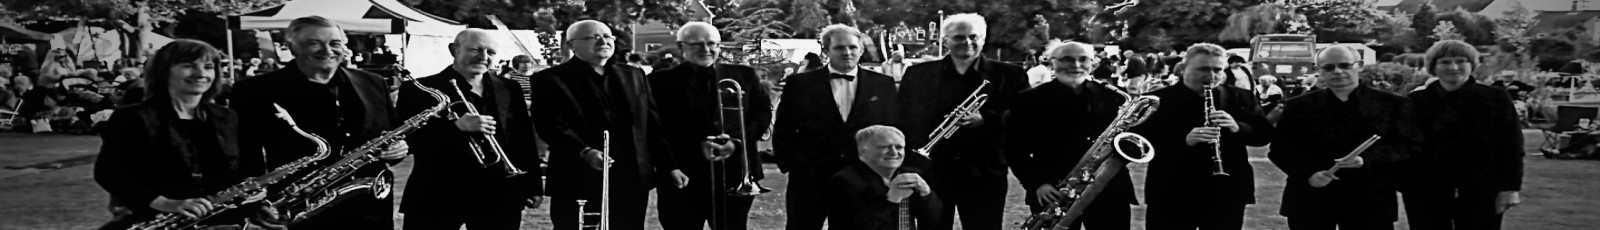 The Ockbrook Big Band